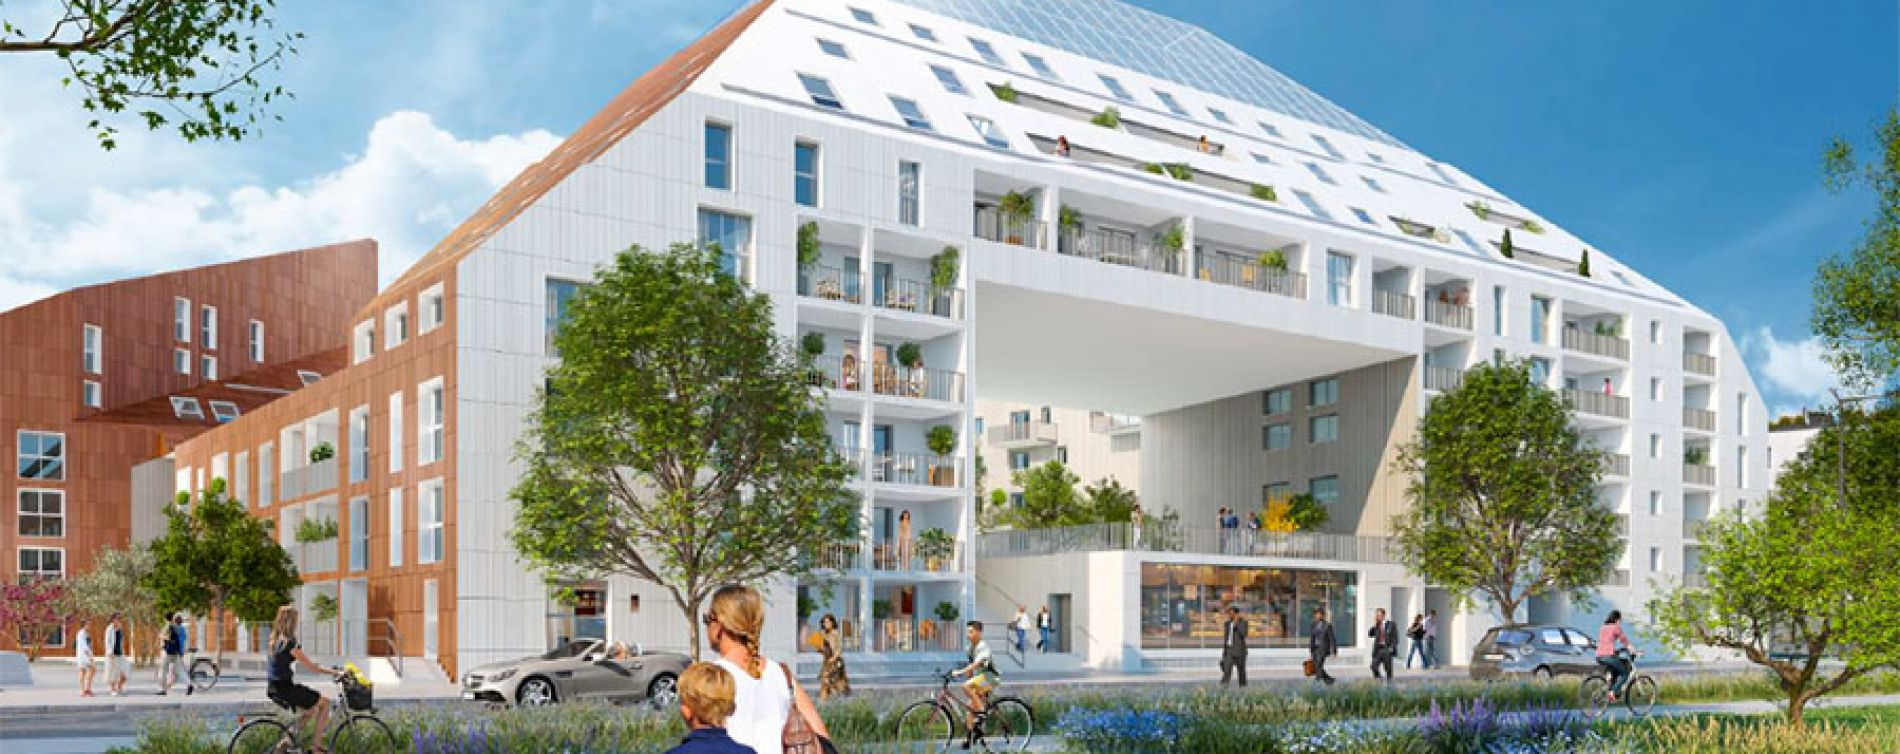 Riv o cosmopolitain bordeaux programme immobilier neuf for Vente appartement bordeaux bastide